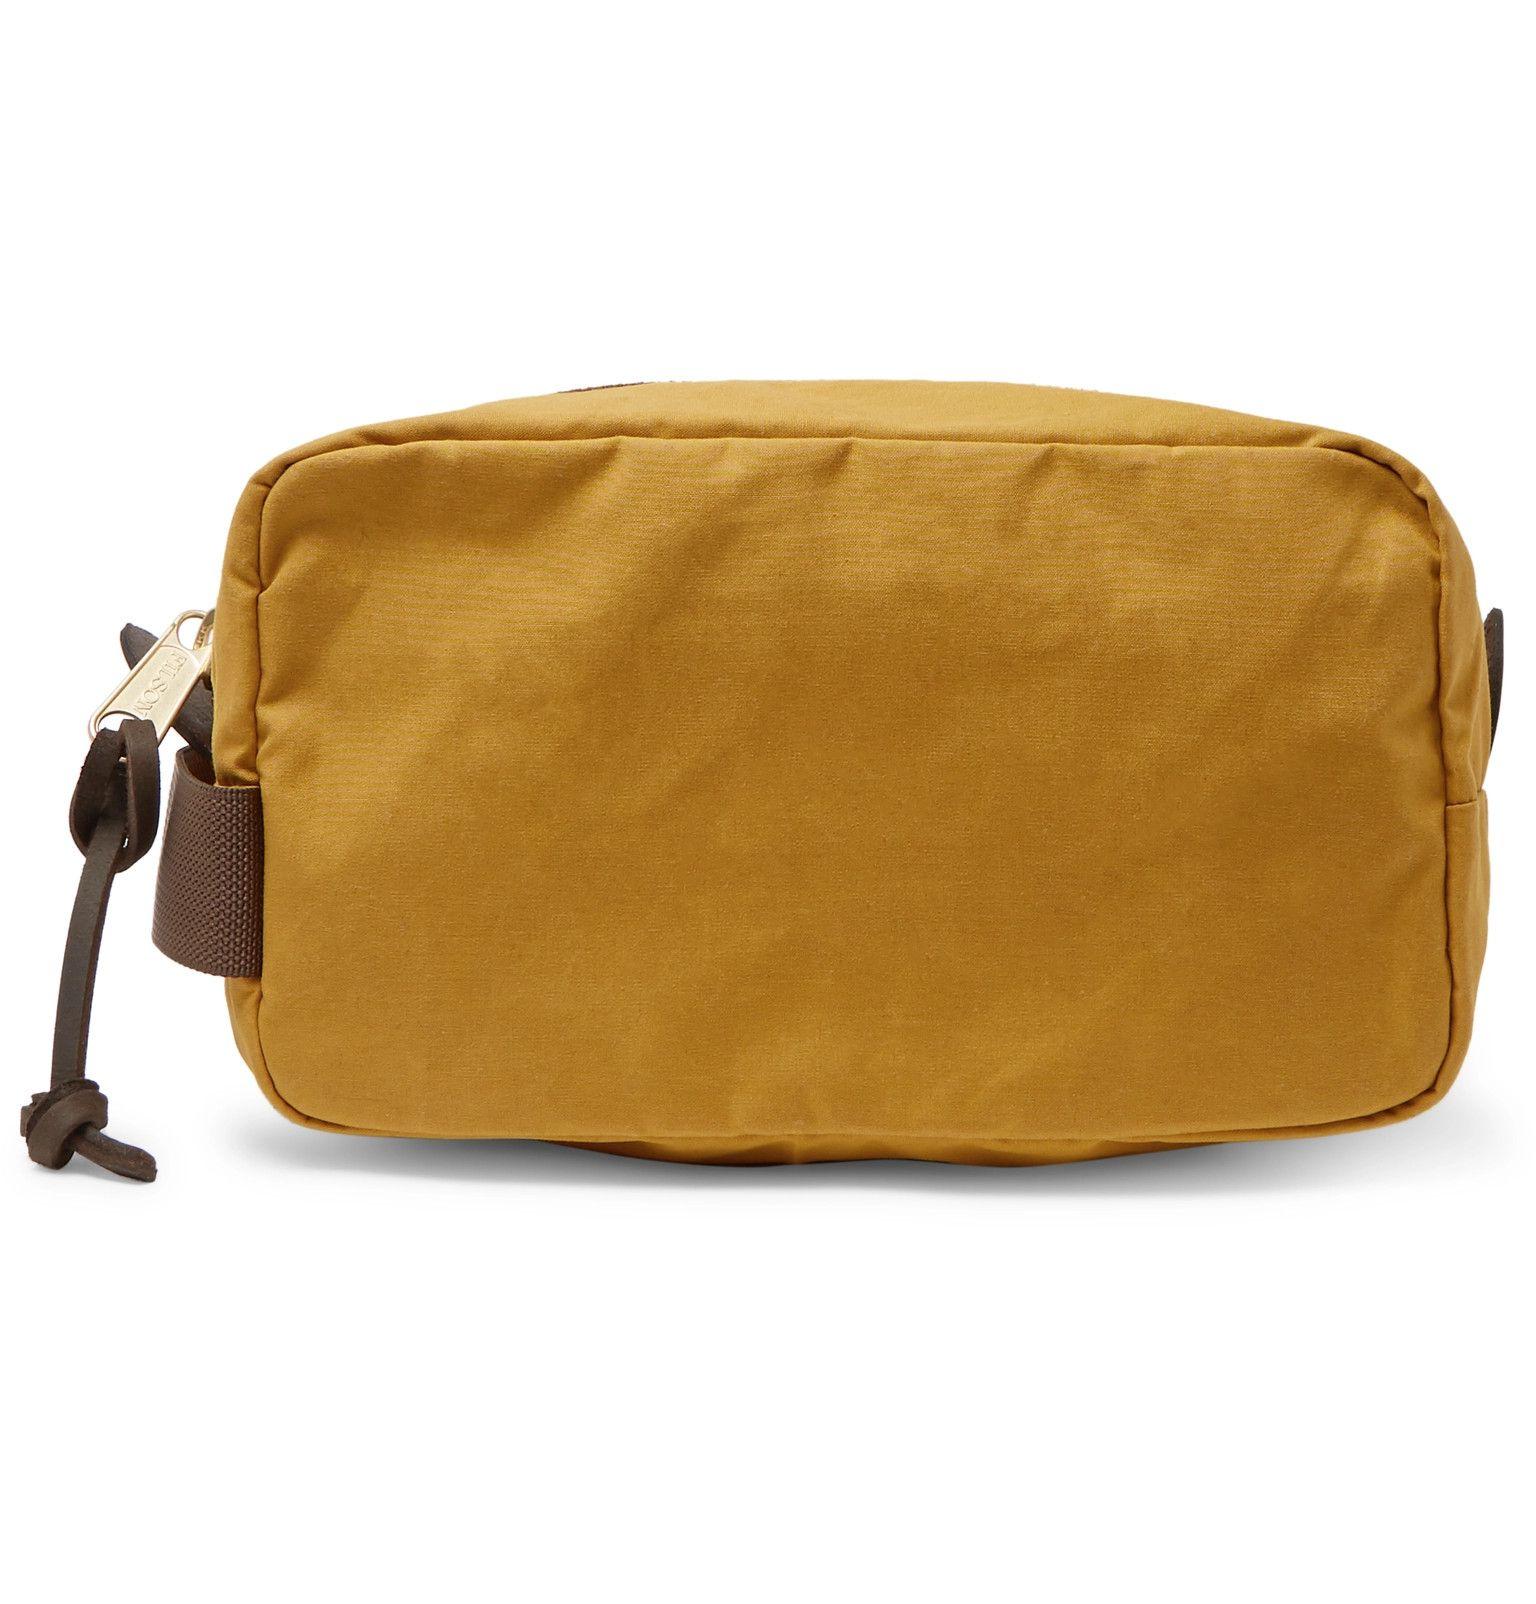 Filson Canvas Wash Bag